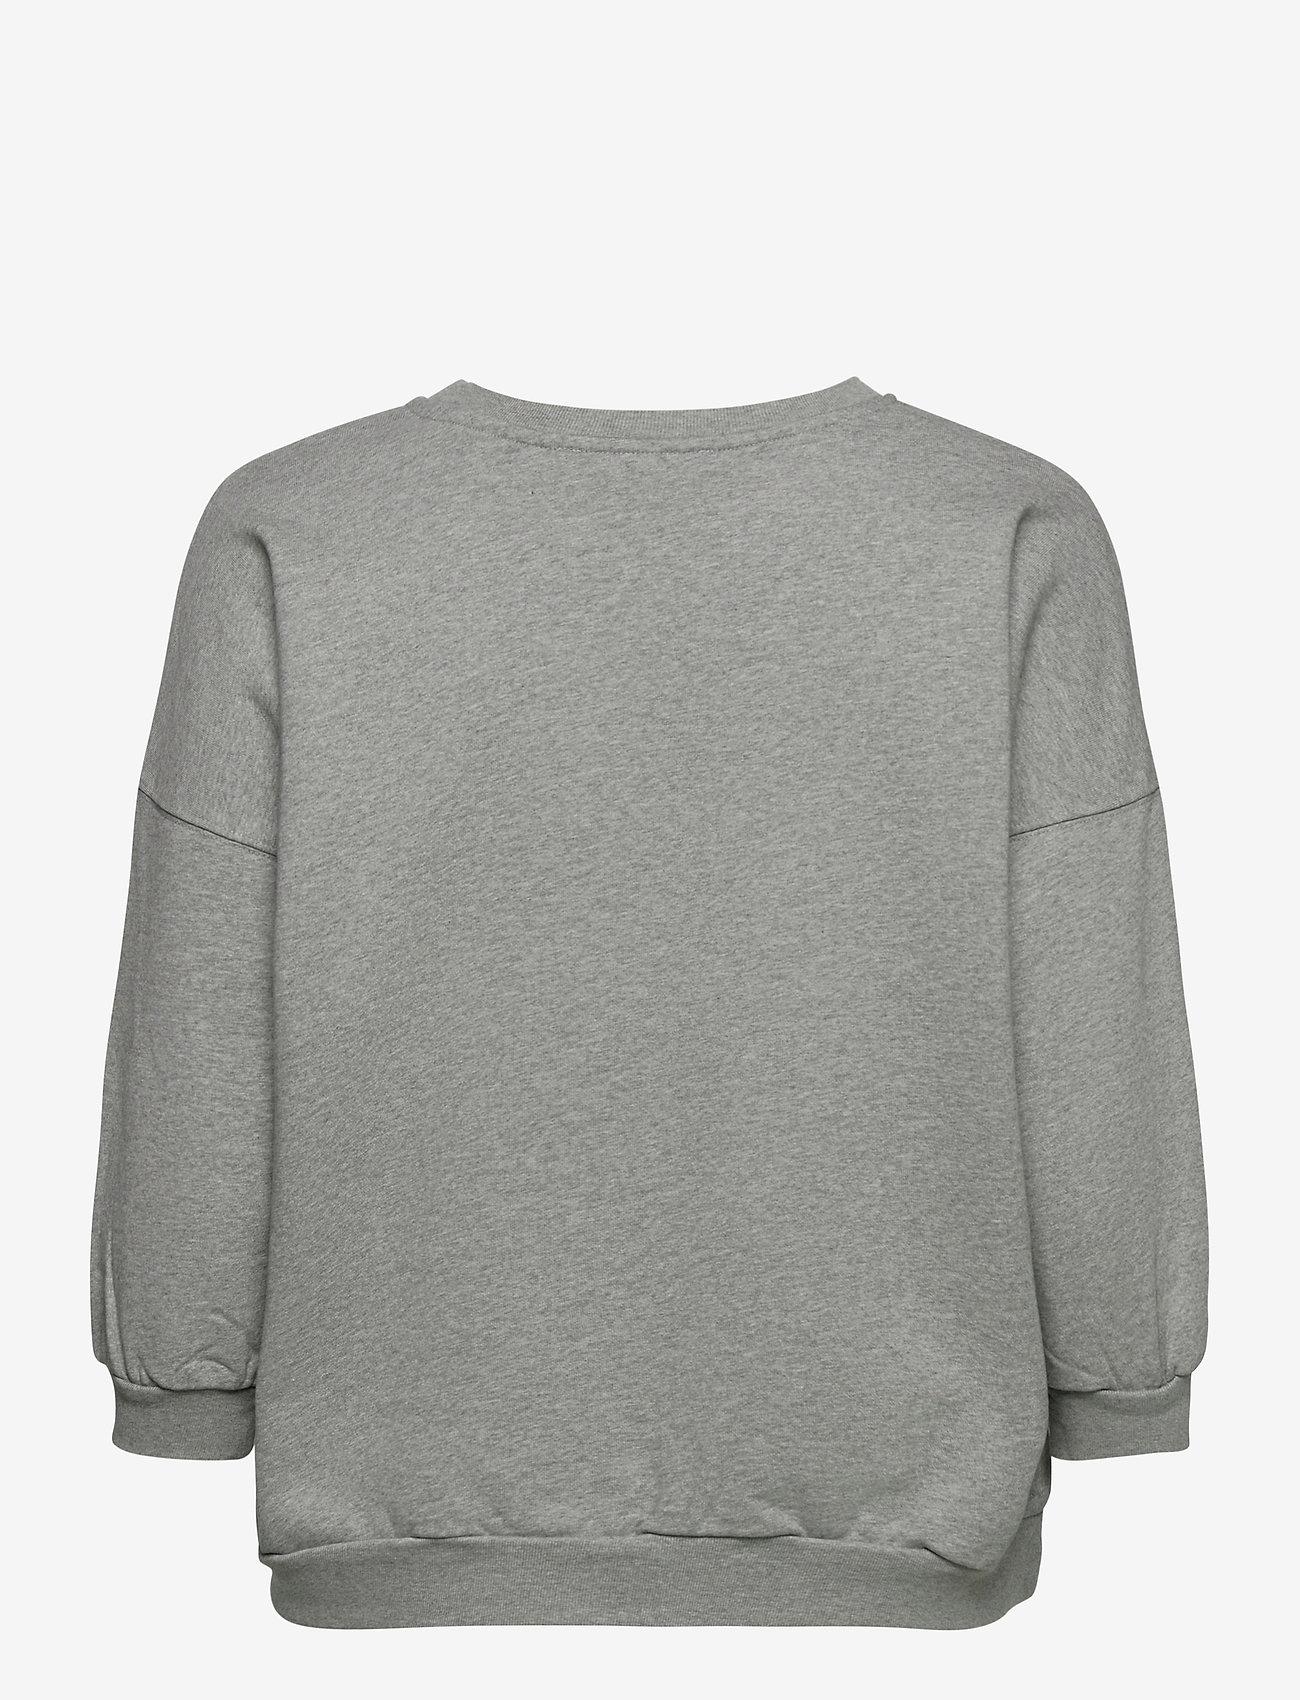 Stamp Storn Sweat (Grey Marl) (99 €) - AllSaints CmHE8